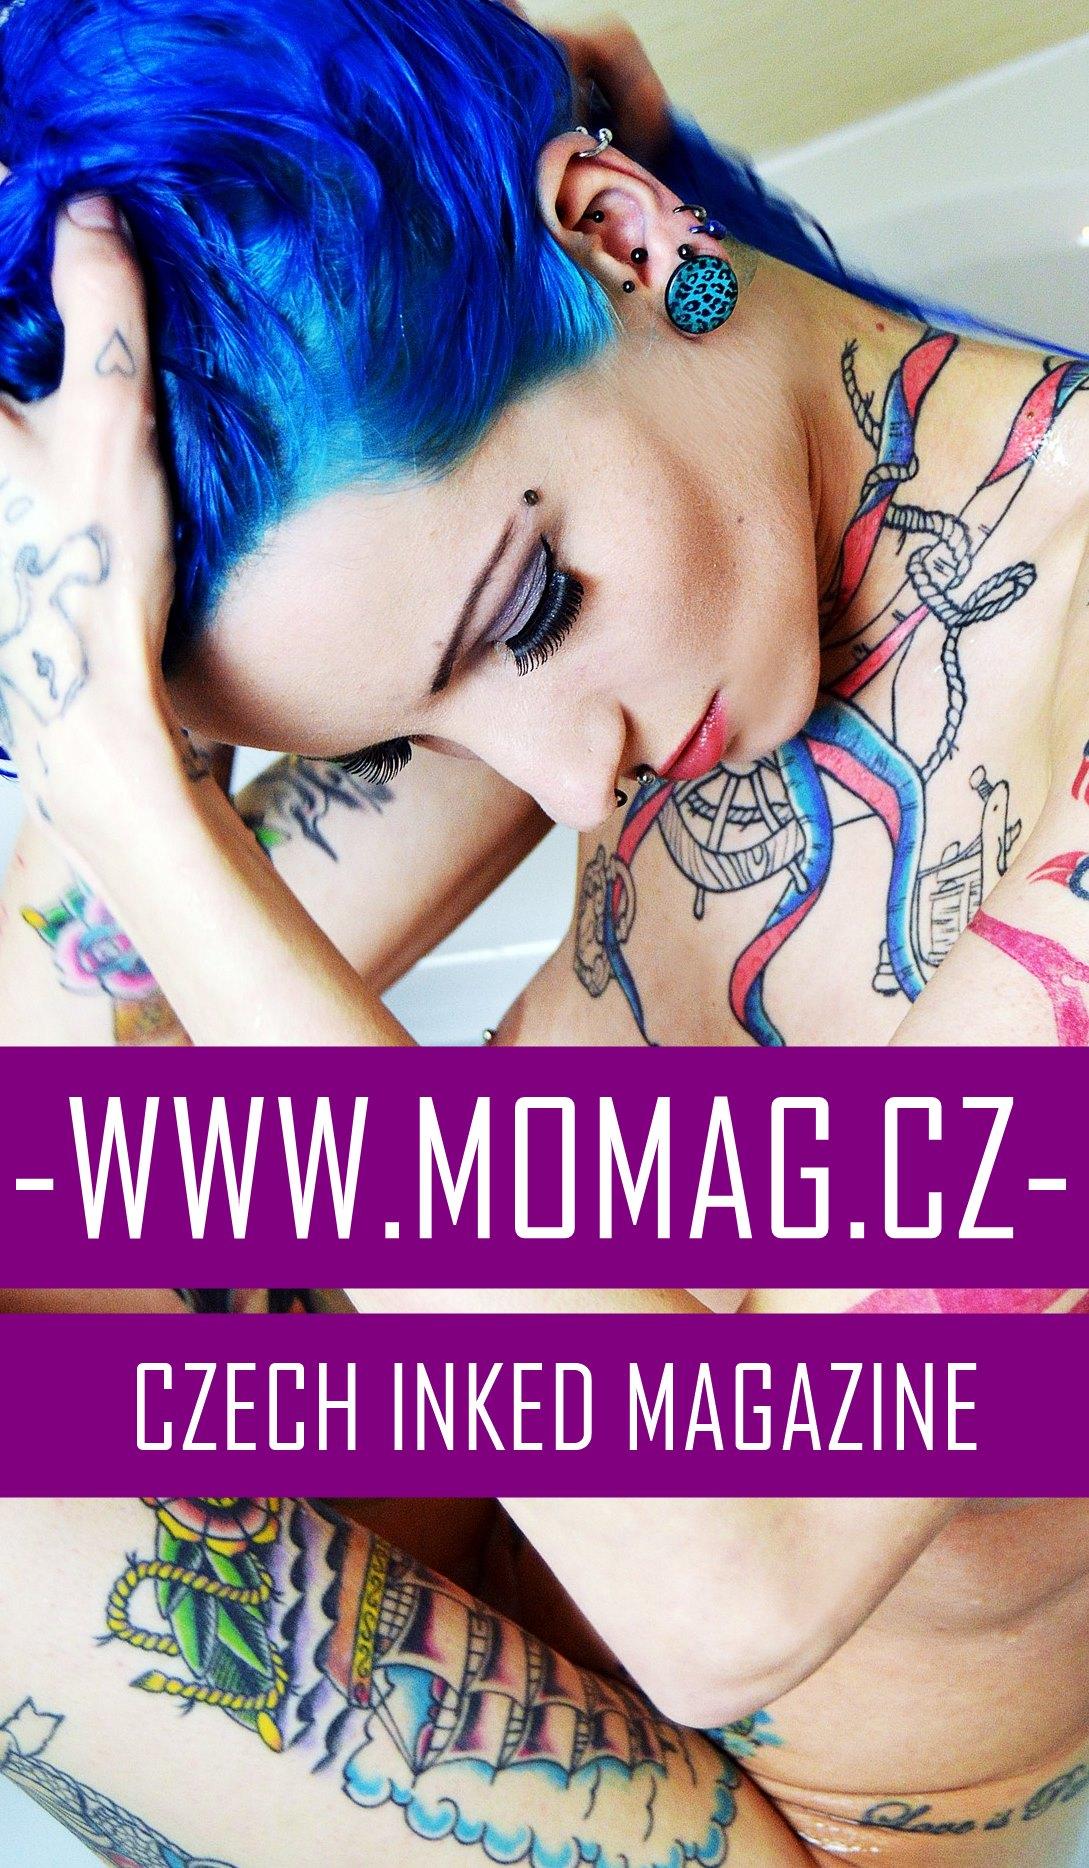 MOMAG Czech Inked Magazine